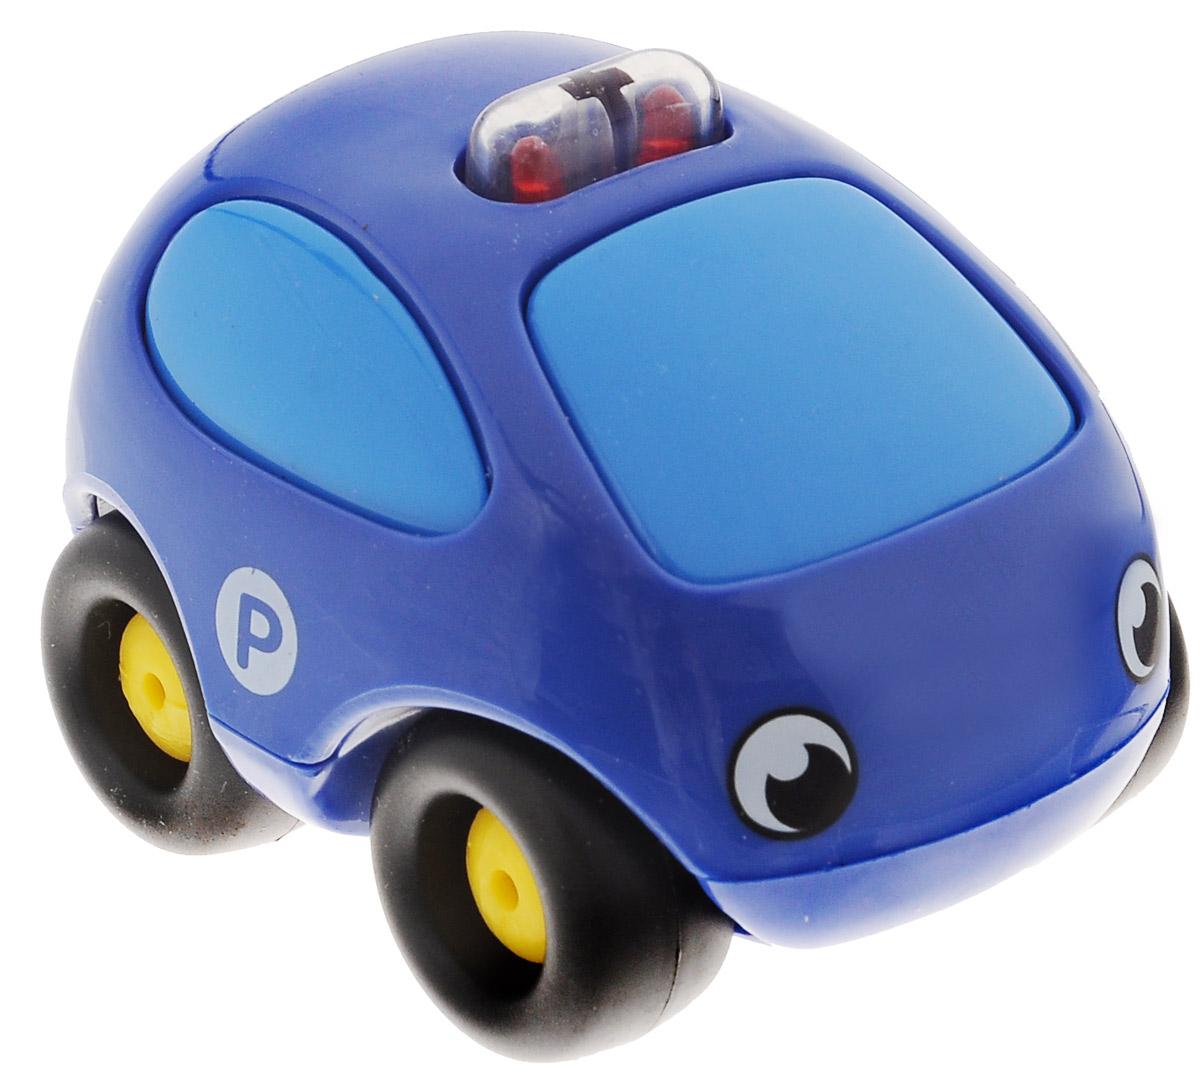 Smoby Машинка Vroom Planet цвет синий smoby машинка vroom planet цвет красный желтый